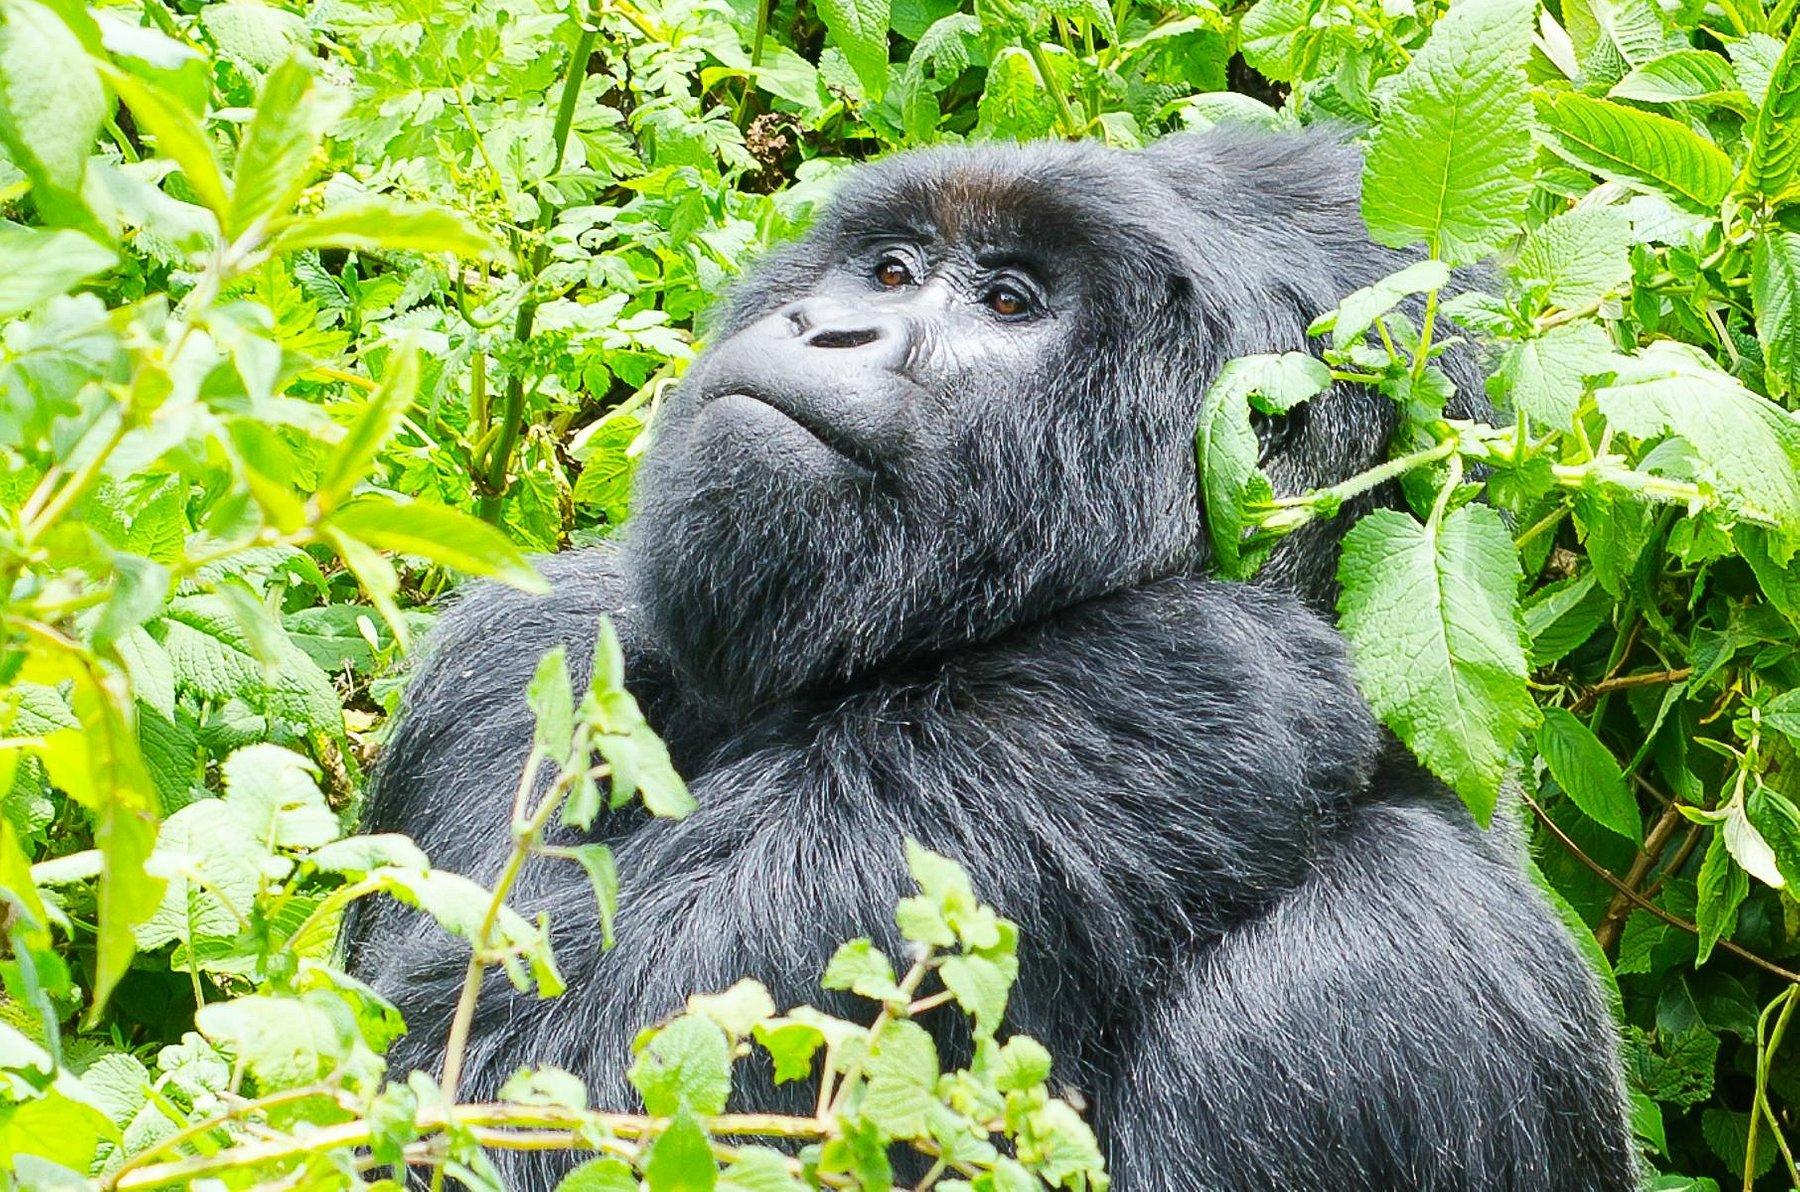 Gorillas in Mgahinga Gorilla National Park